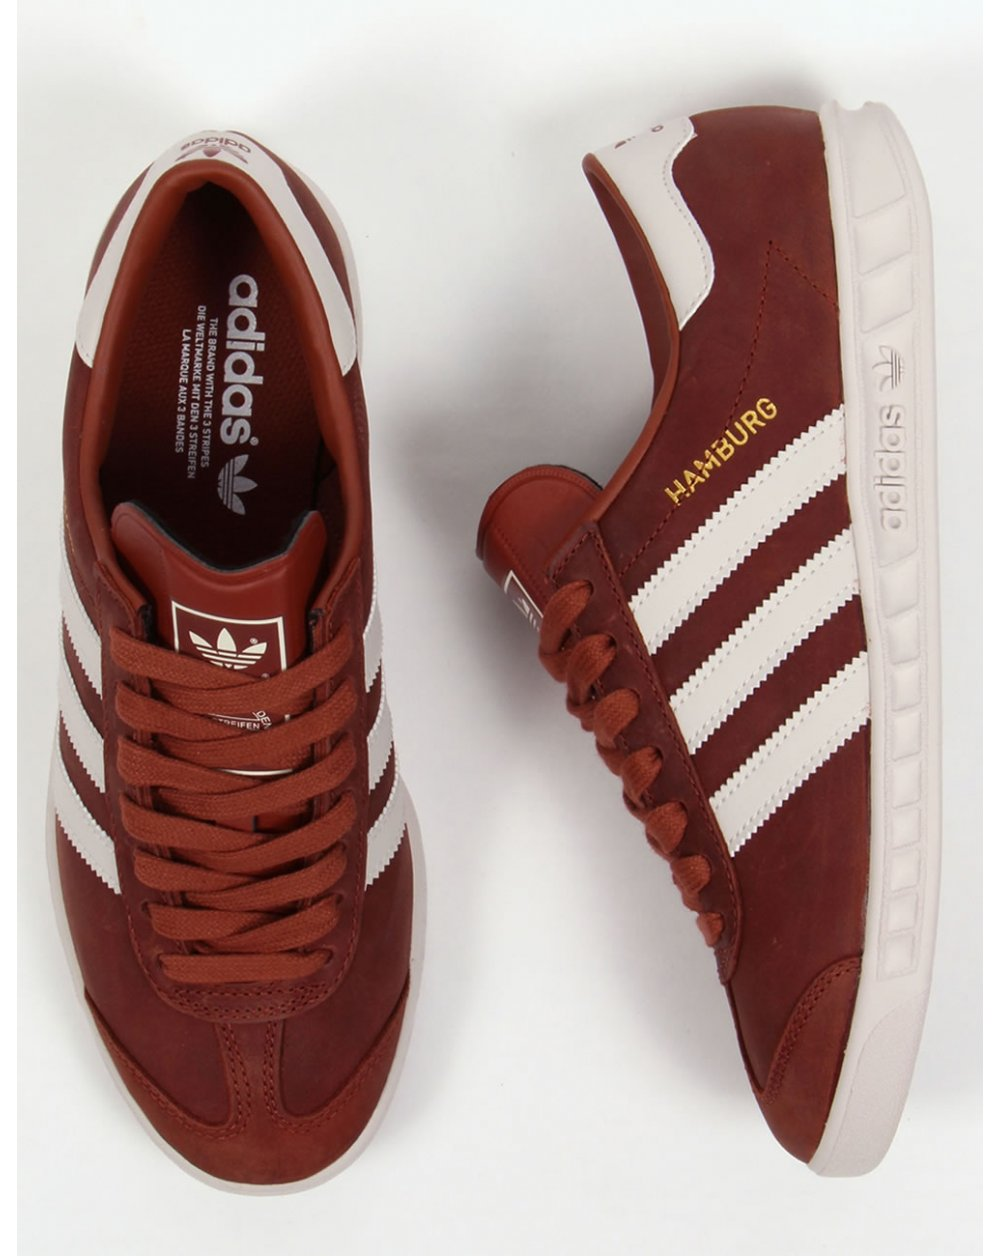 Details about Adidas Marathon Trainer Brown&Cream Trim Leather Athletic Shoes Men's 10